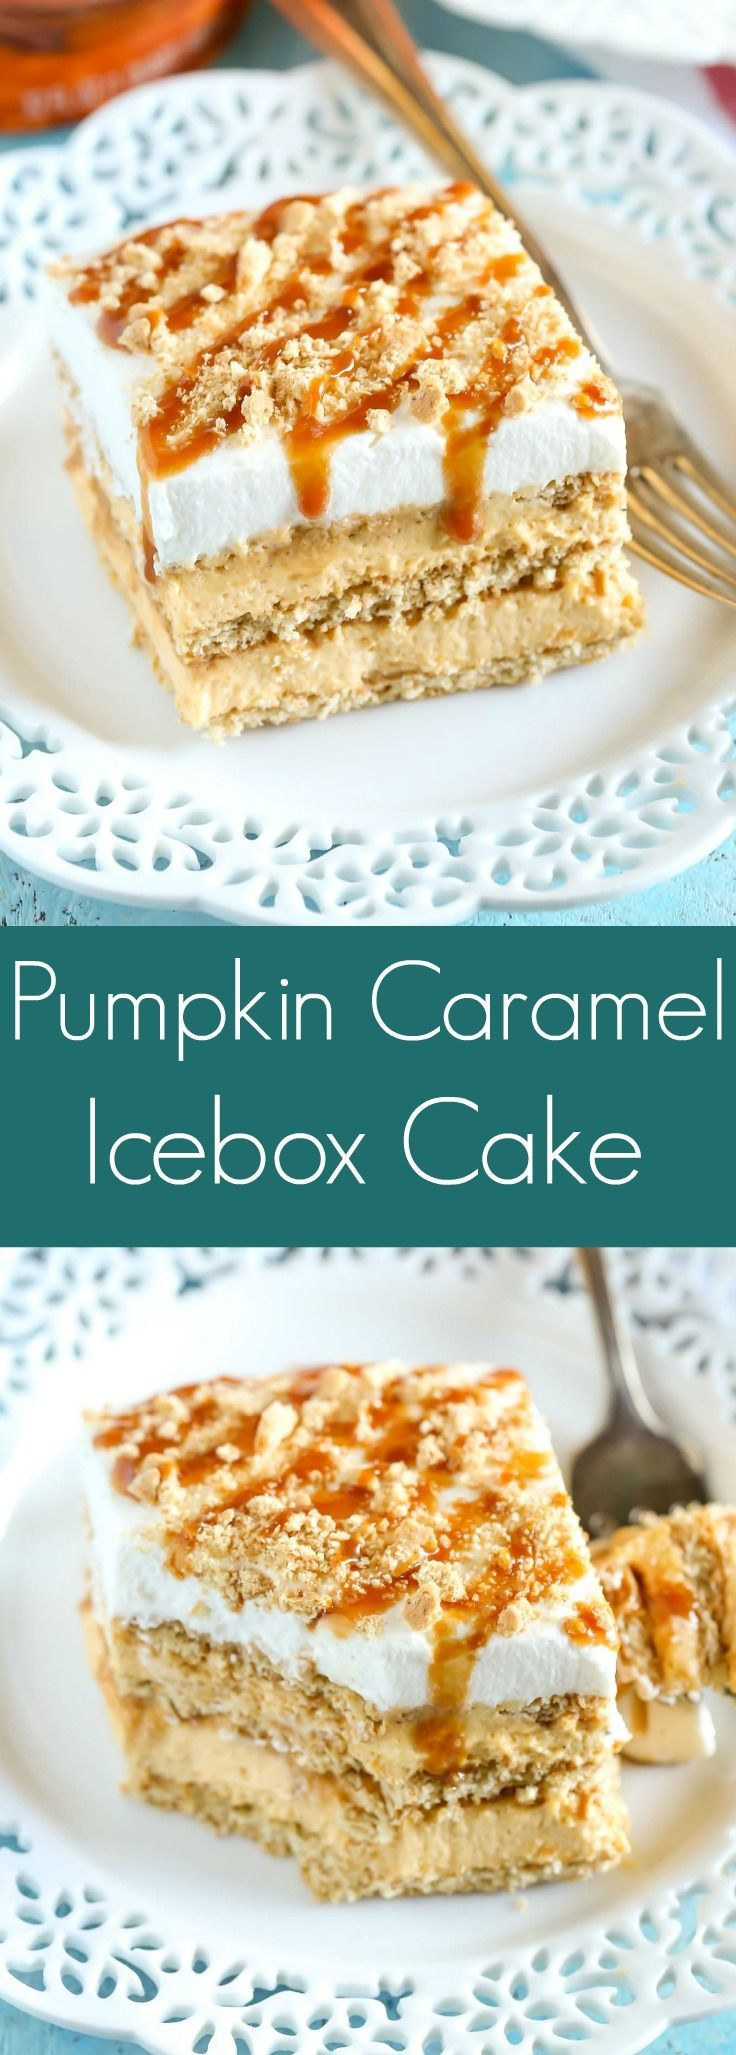 No Bake Fall Desserts  No Bake Pumpkin Caramel Icebox Cake Recipe